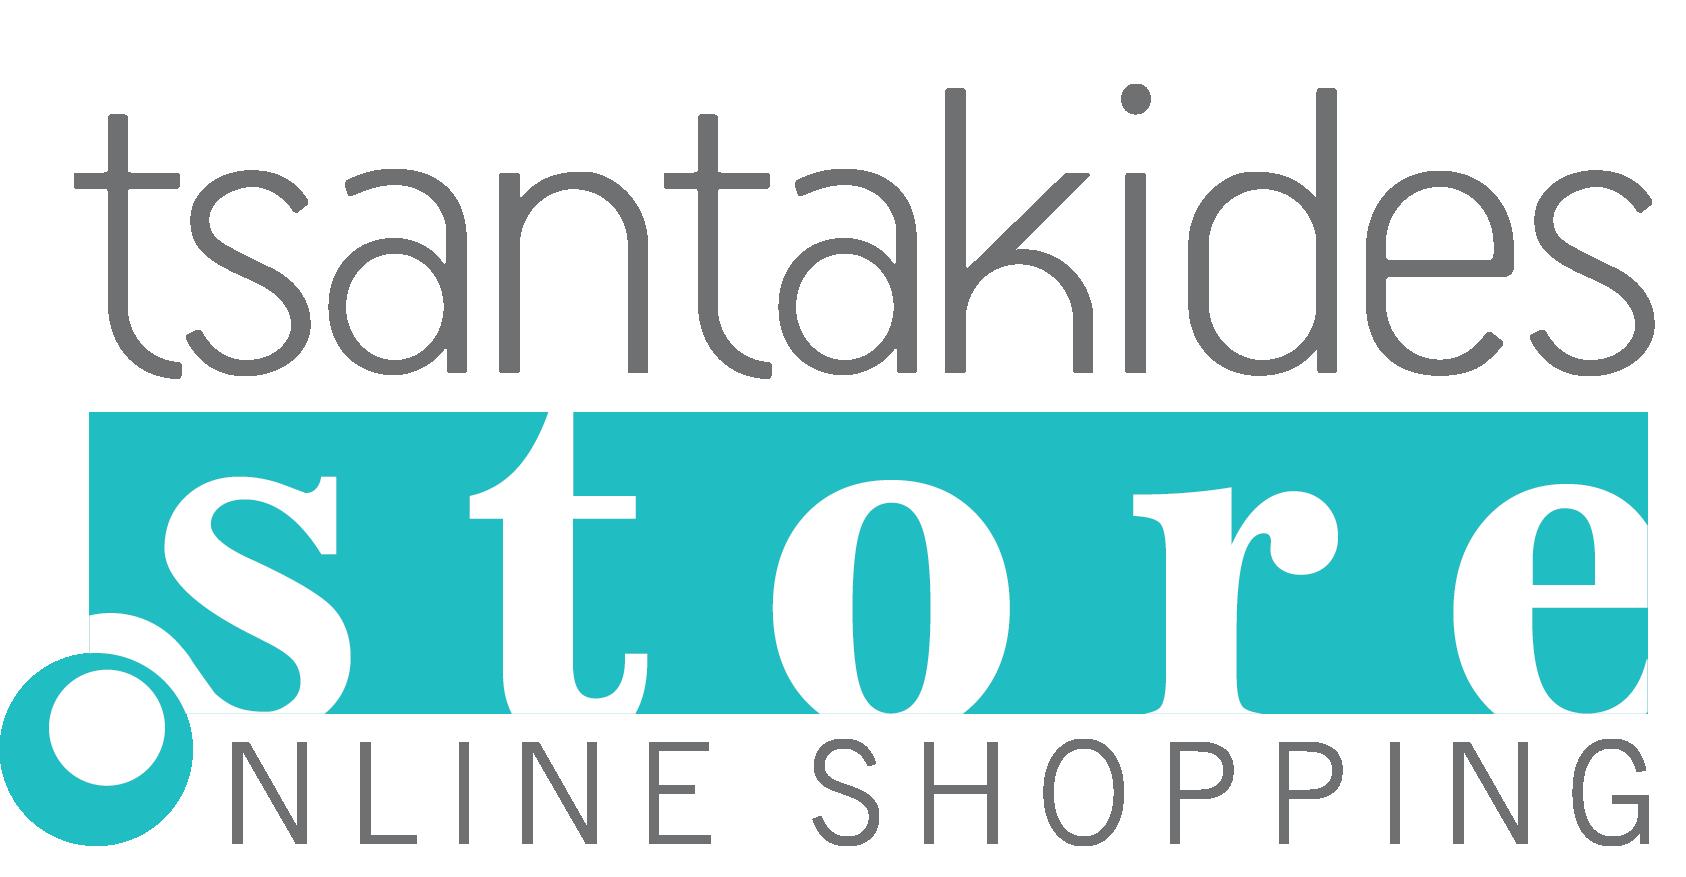 tsantakides.store